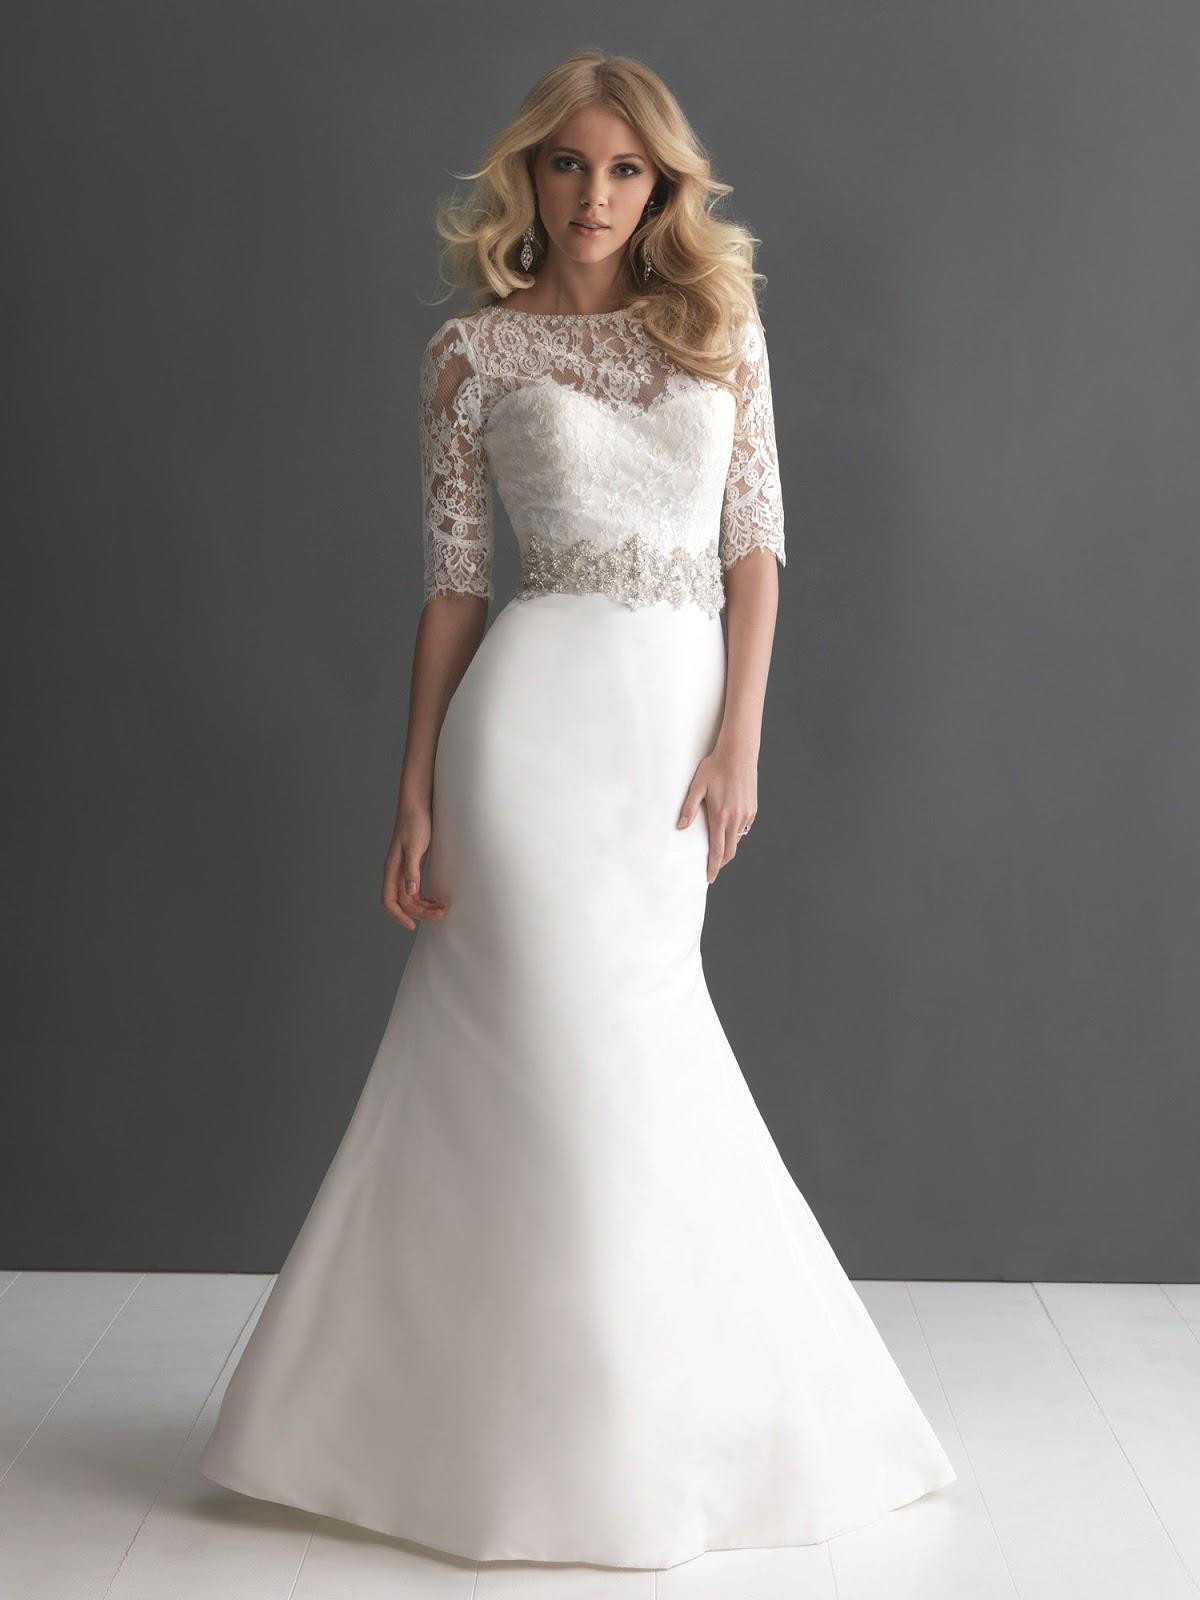 Best Of Wedding Dresses Newcastle Cheap – Wedding